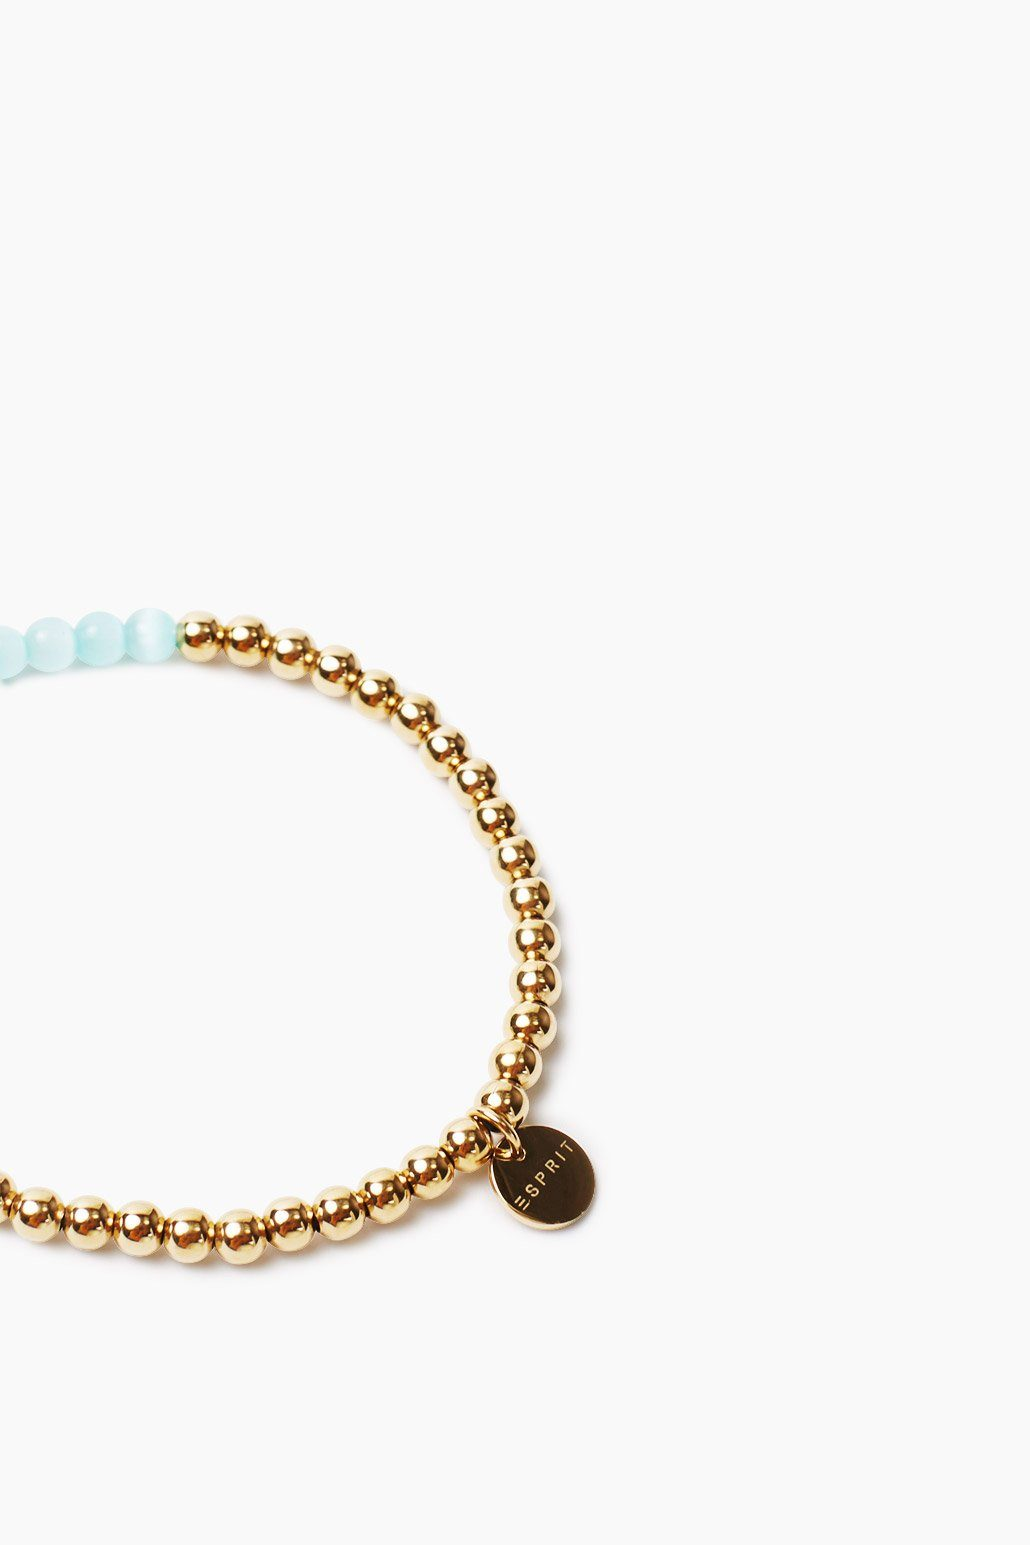 ESPRIT CASUAL Armband aus vergoldeten Edelstahlperlen